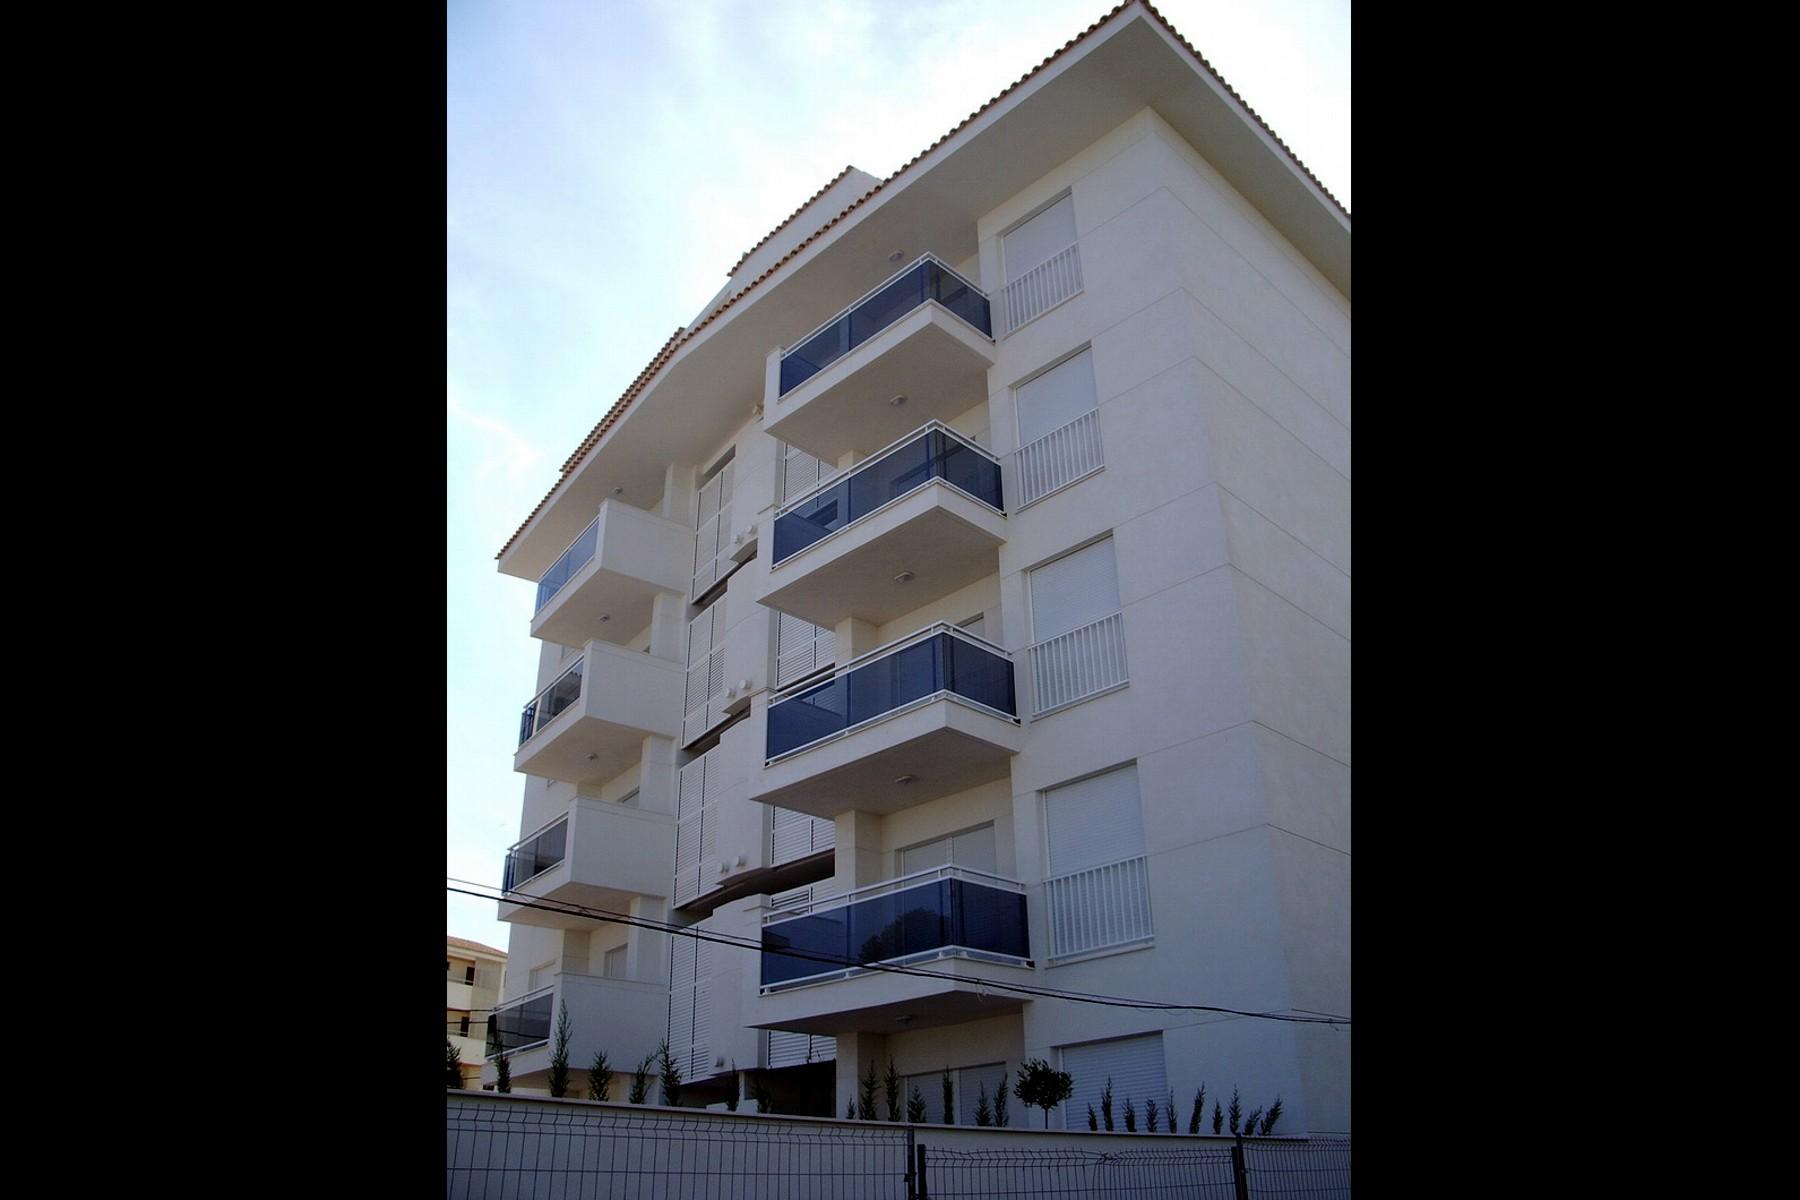 Imaginarq-155-Edificio-Viviendas-Altea-Alicante-19A